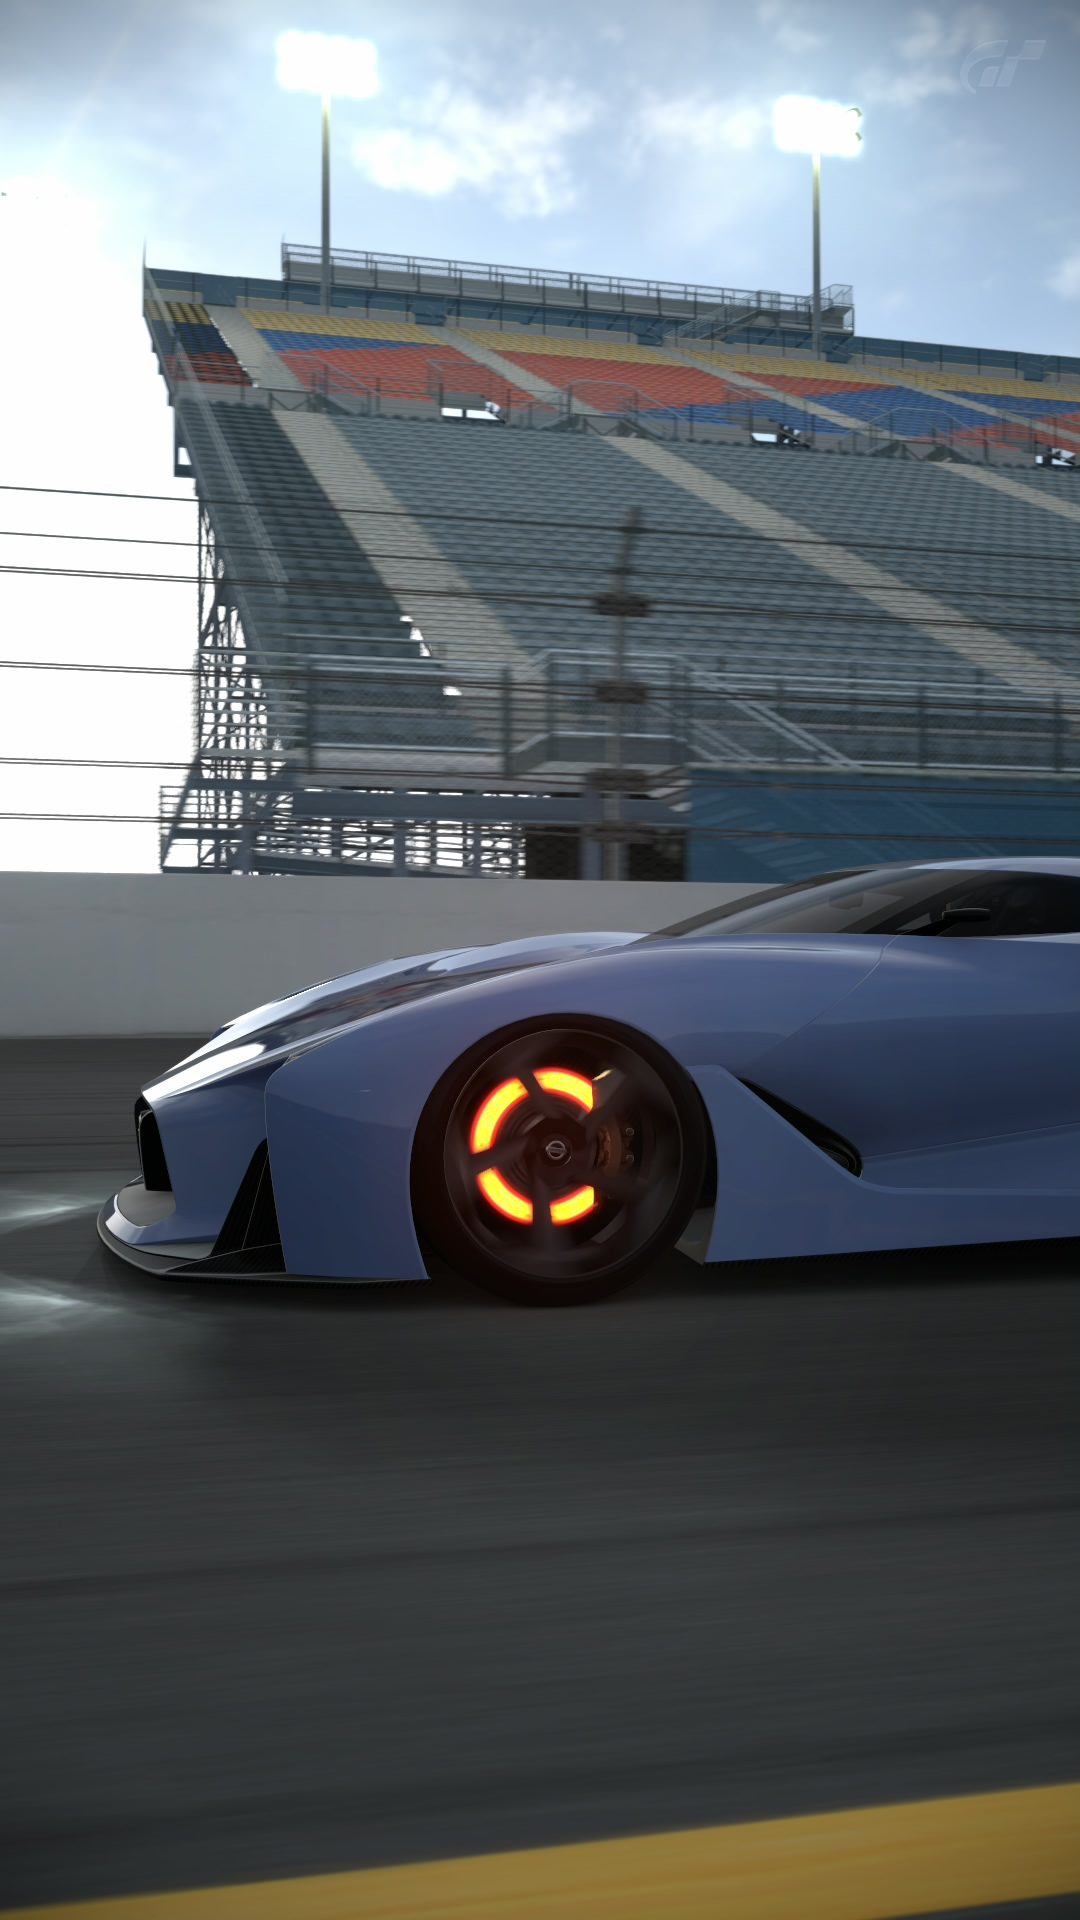 Daytona Road Course - Nissan VGT 11.jpg